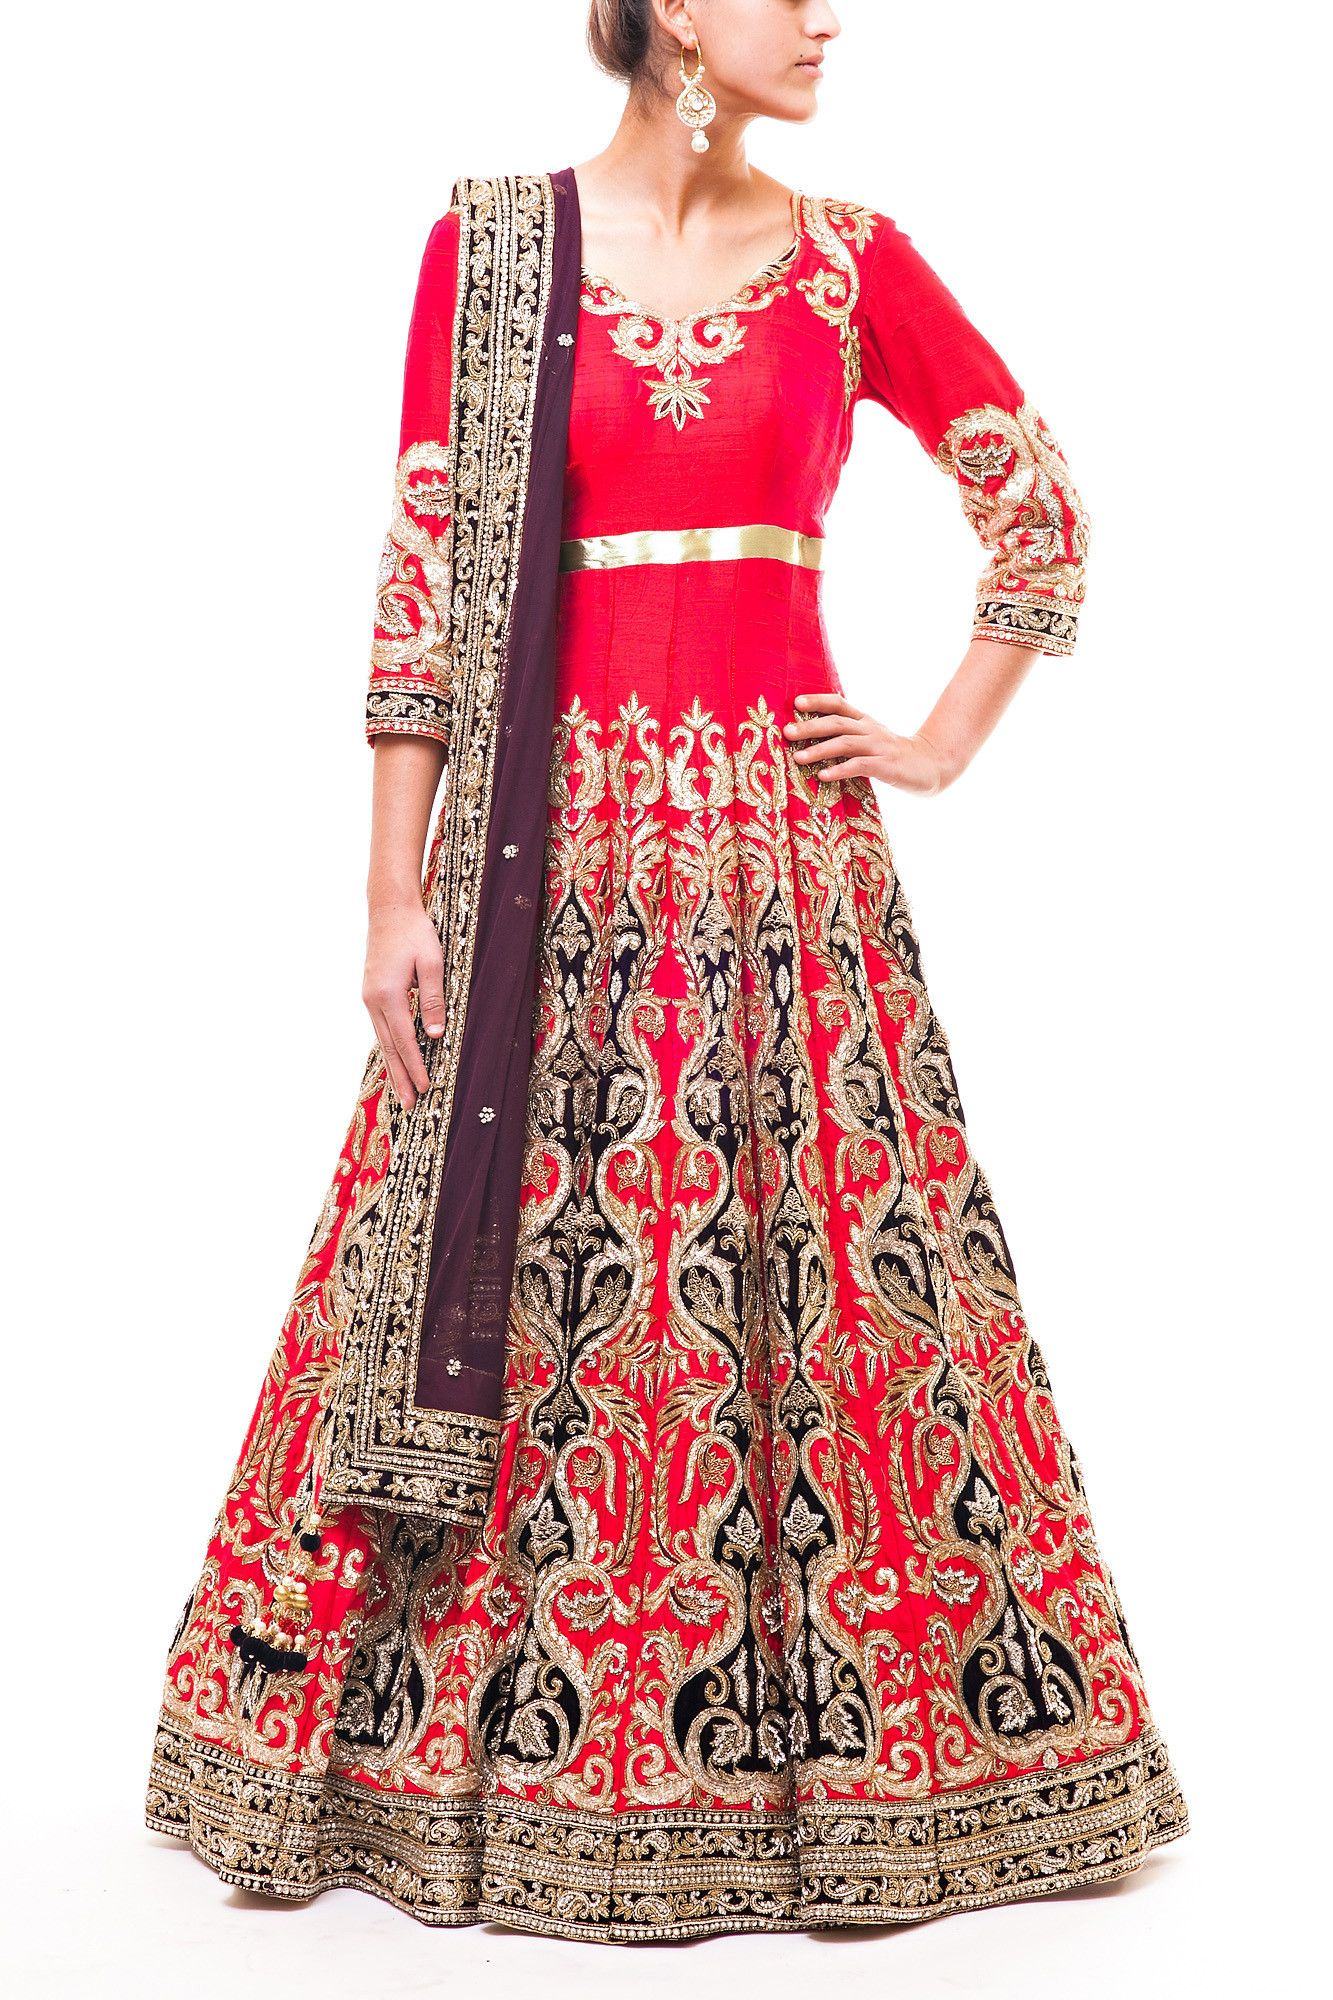 Wellgroomed Designs- Gorgeous Red Bridal Anarkali | Your Pinterest ...